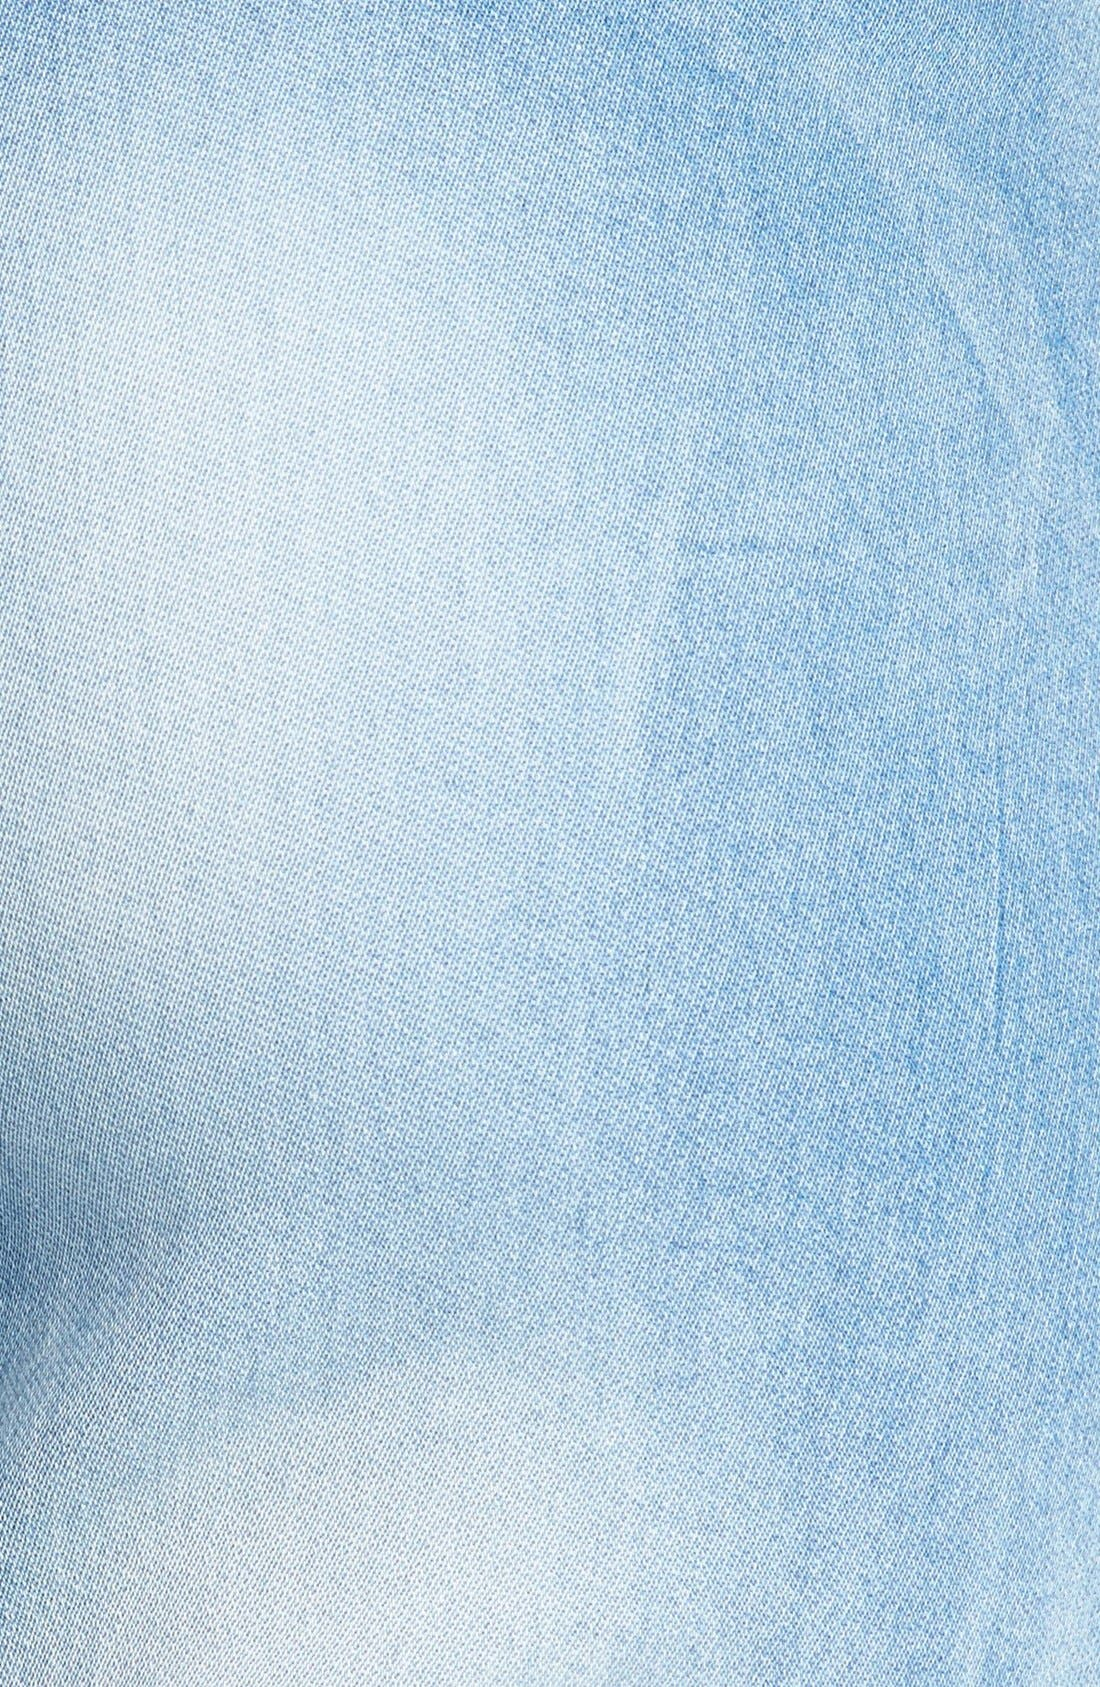 Alternate Image 3  - MICHAEL Michael Kors Studded Drawstring Waist Knit Pants